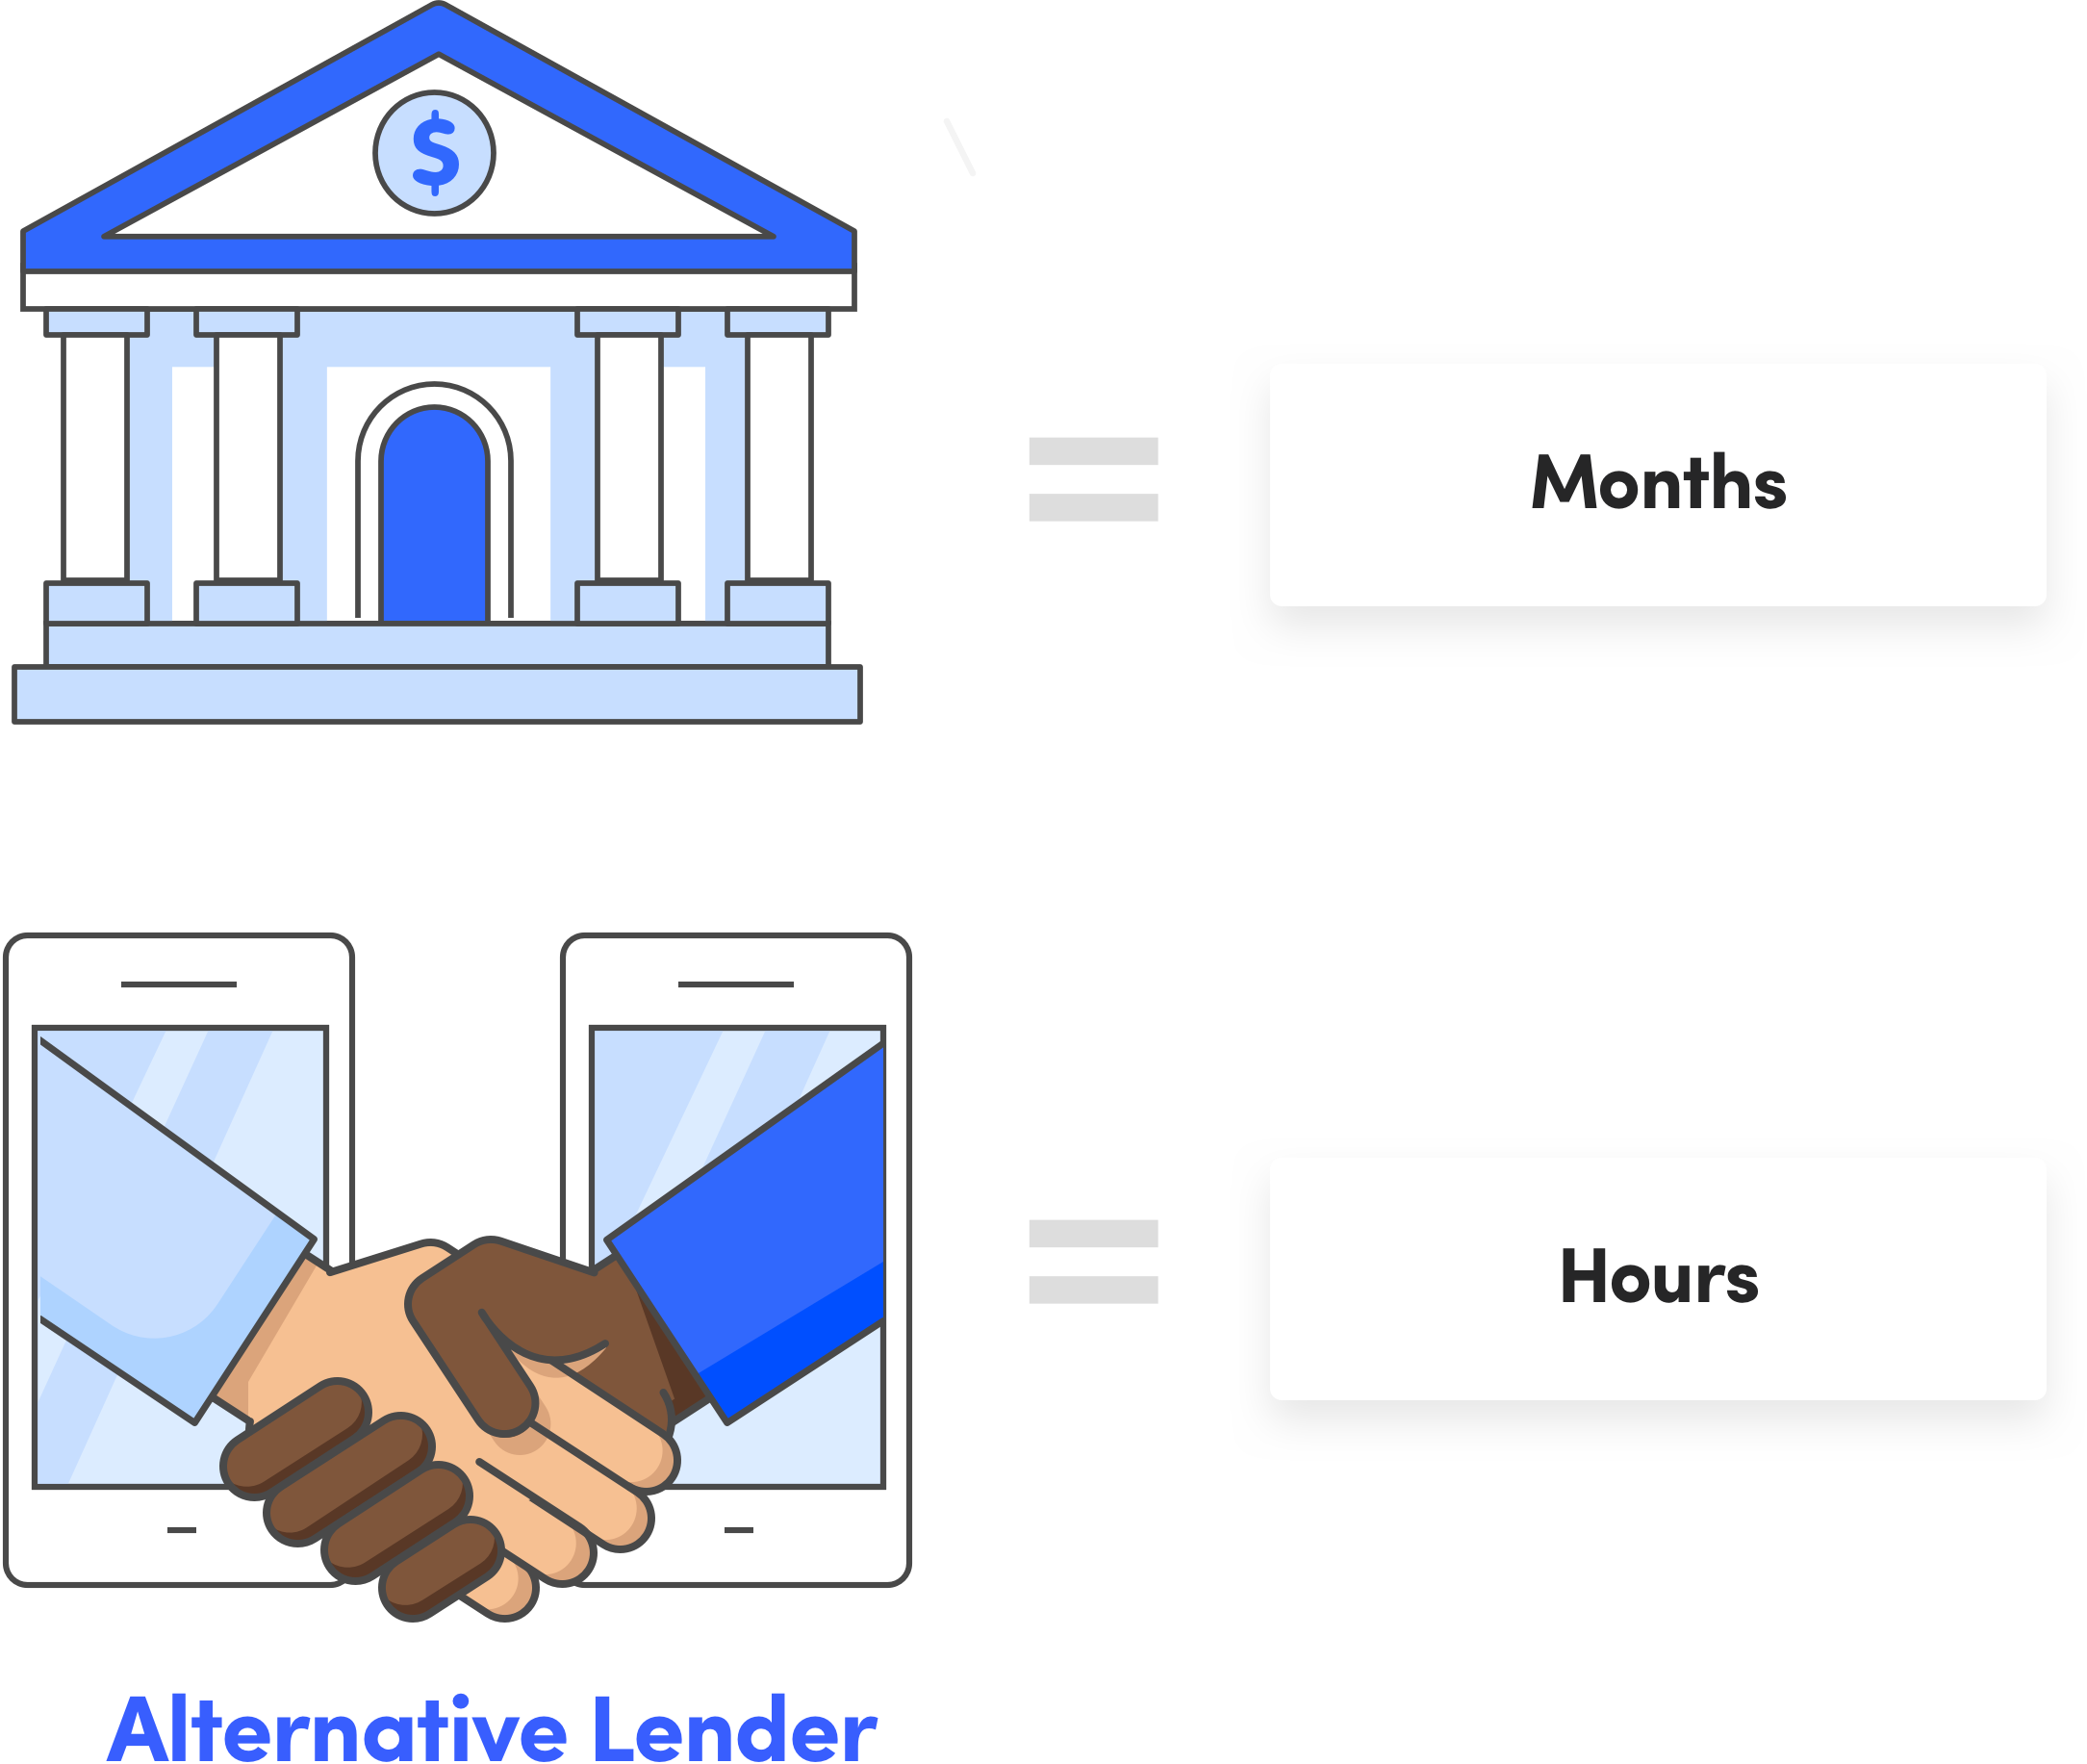 Bank vs Alternative Lender